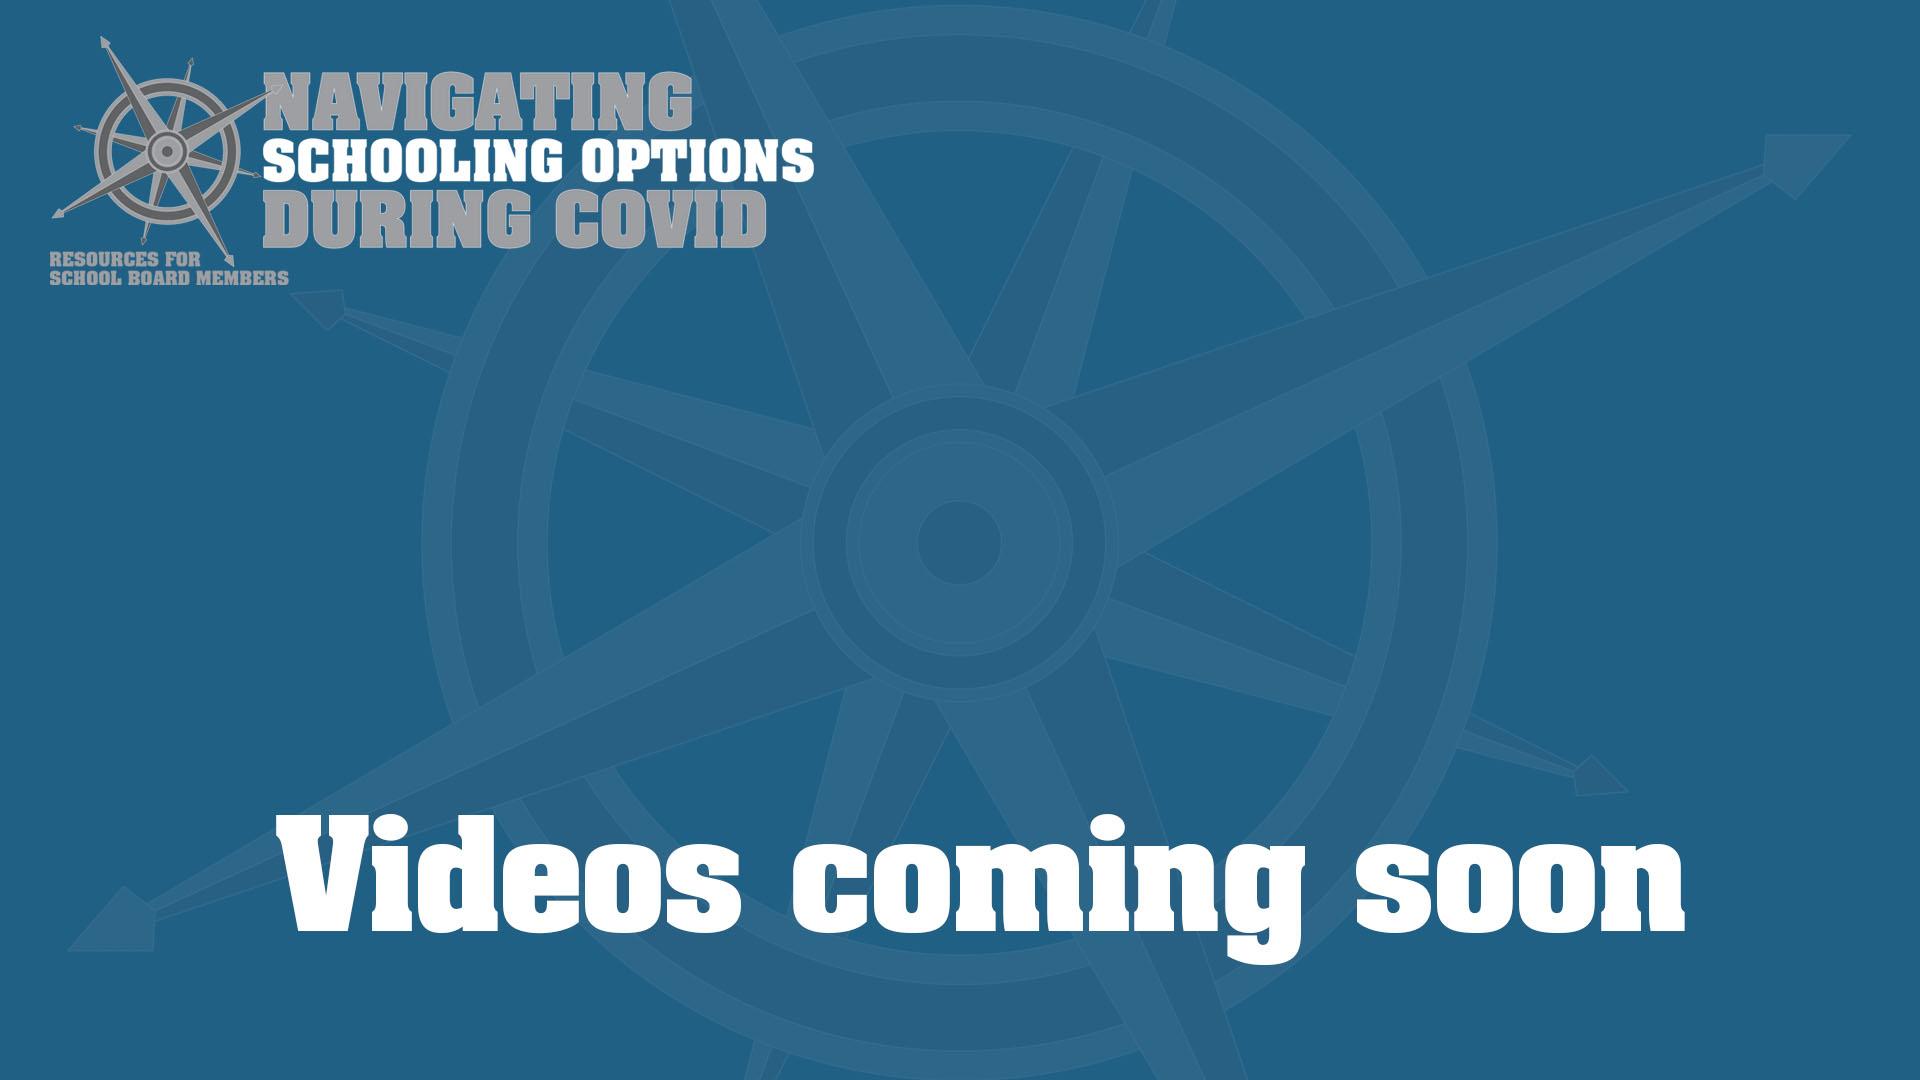 Videos coming soon